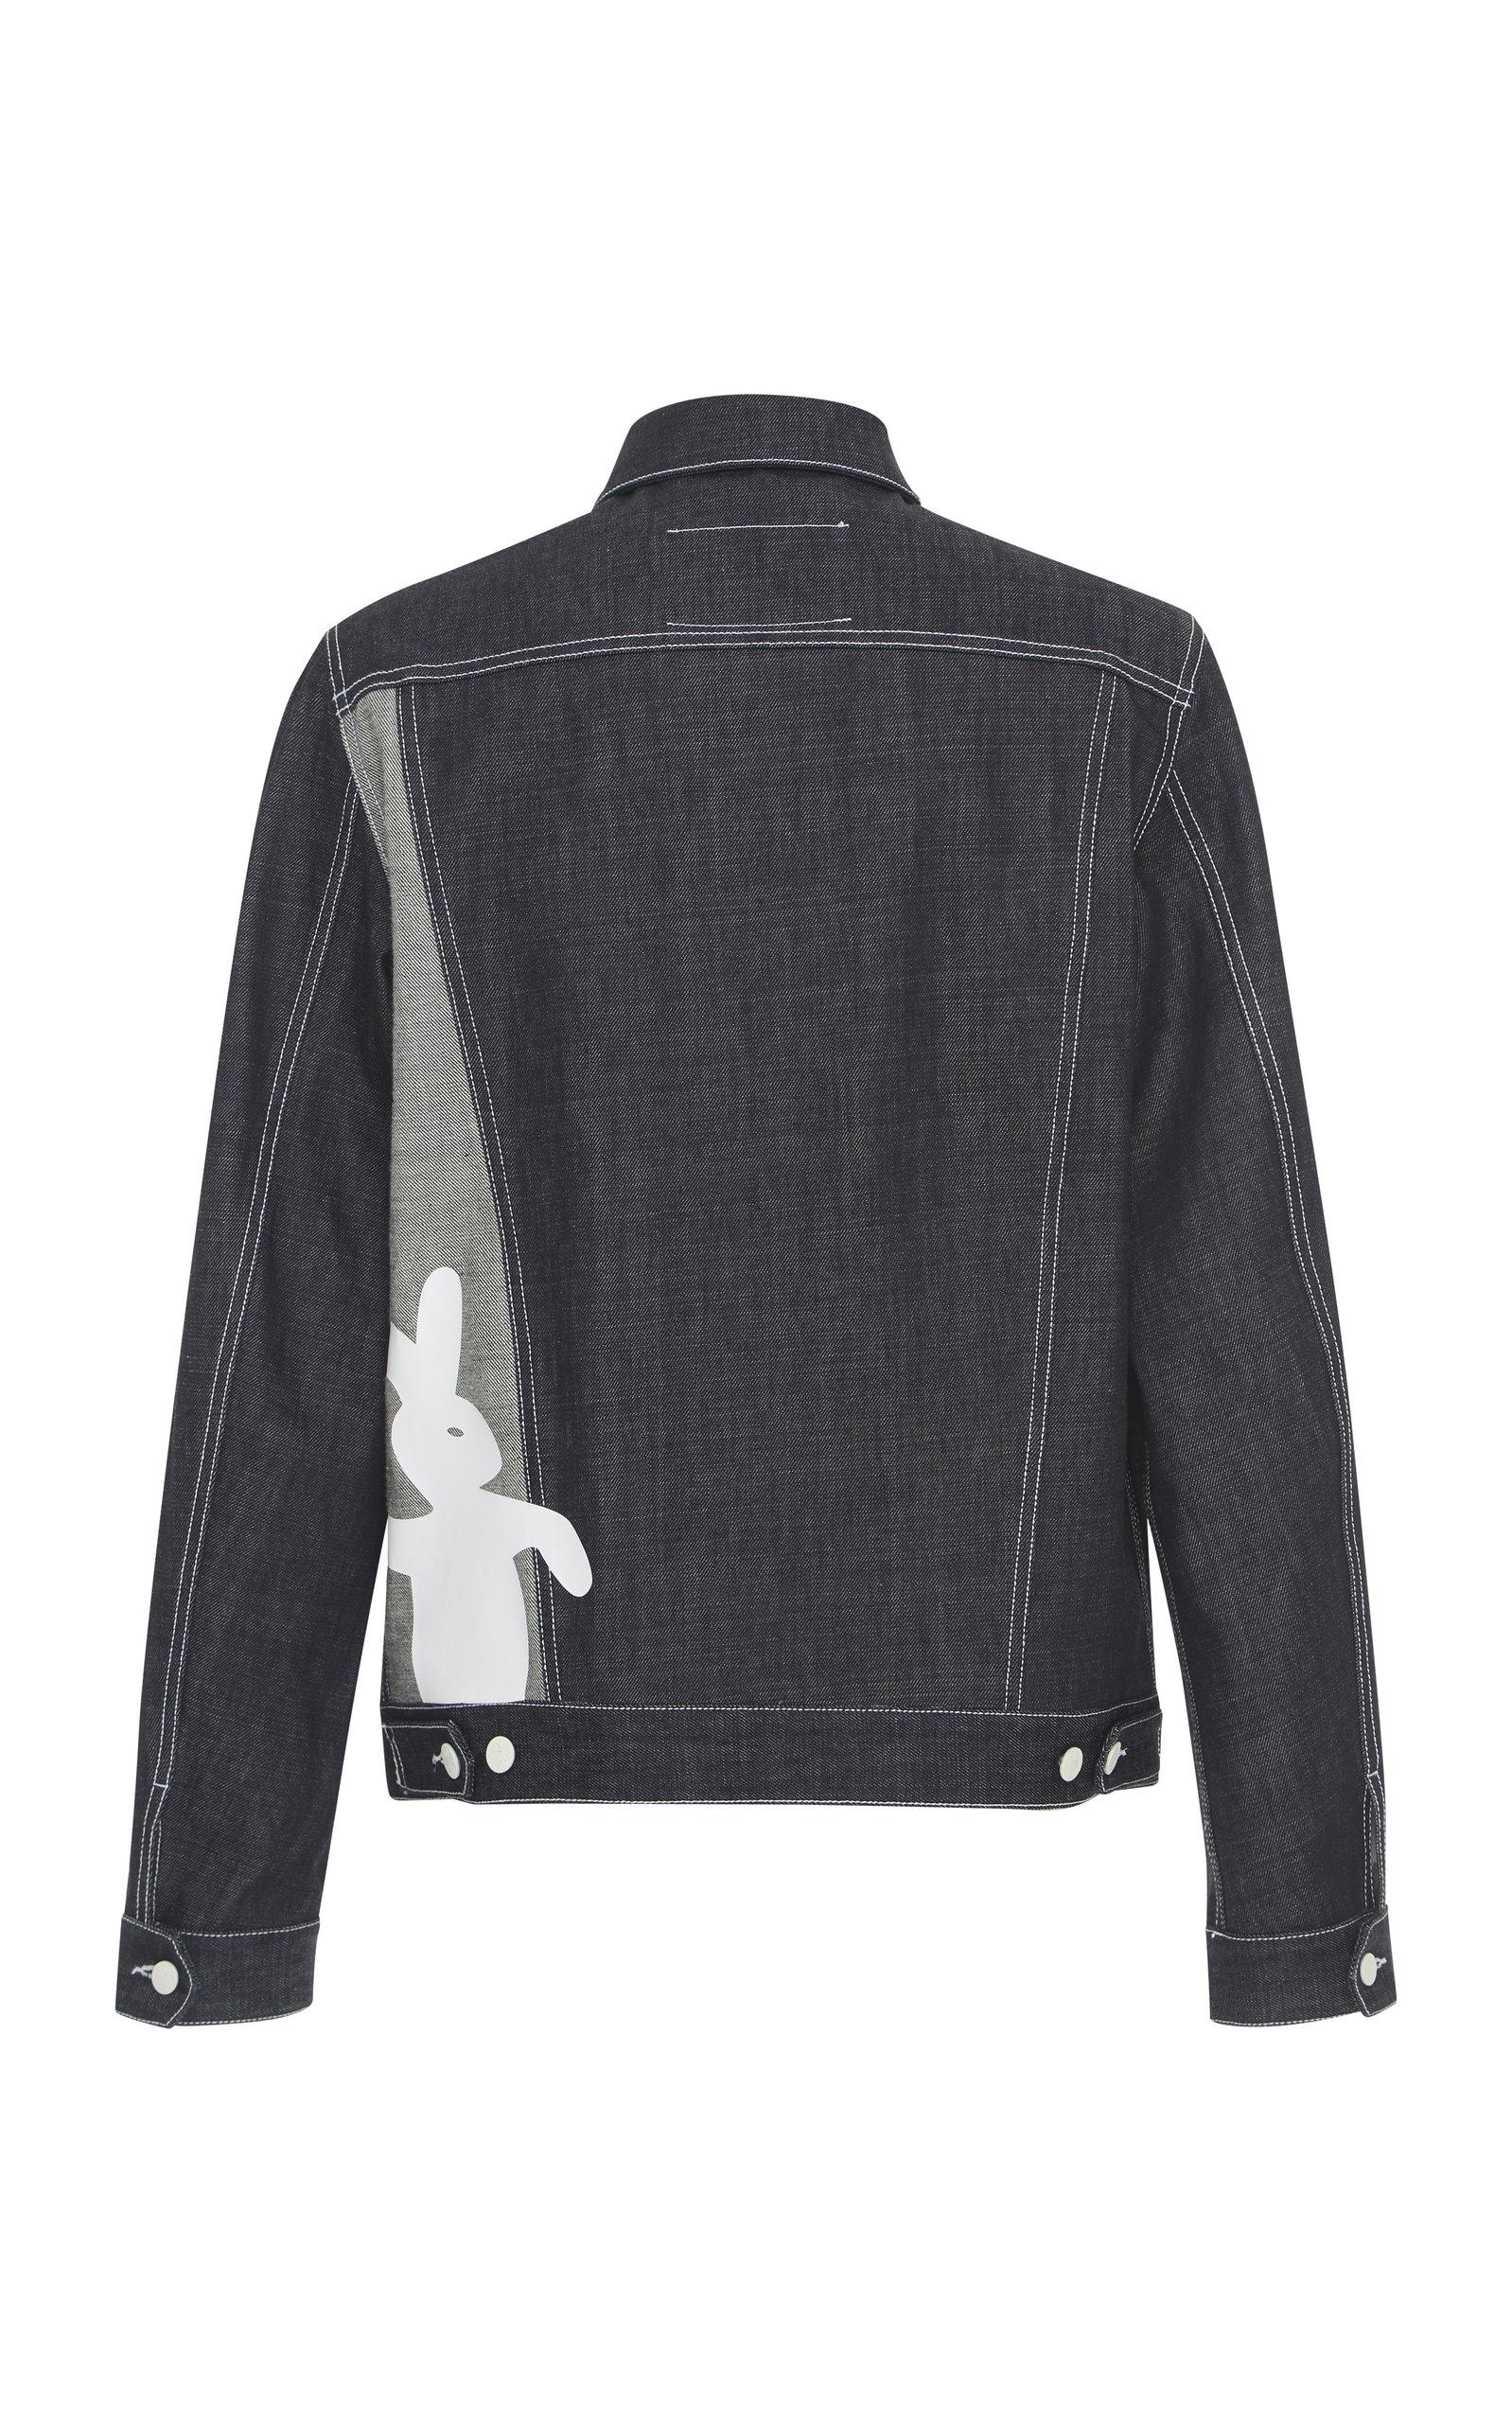 Printed Printed Jacket Unwashed Jacket Printed Unwashed Marni Marni Denim Denim wpr8wPqnR